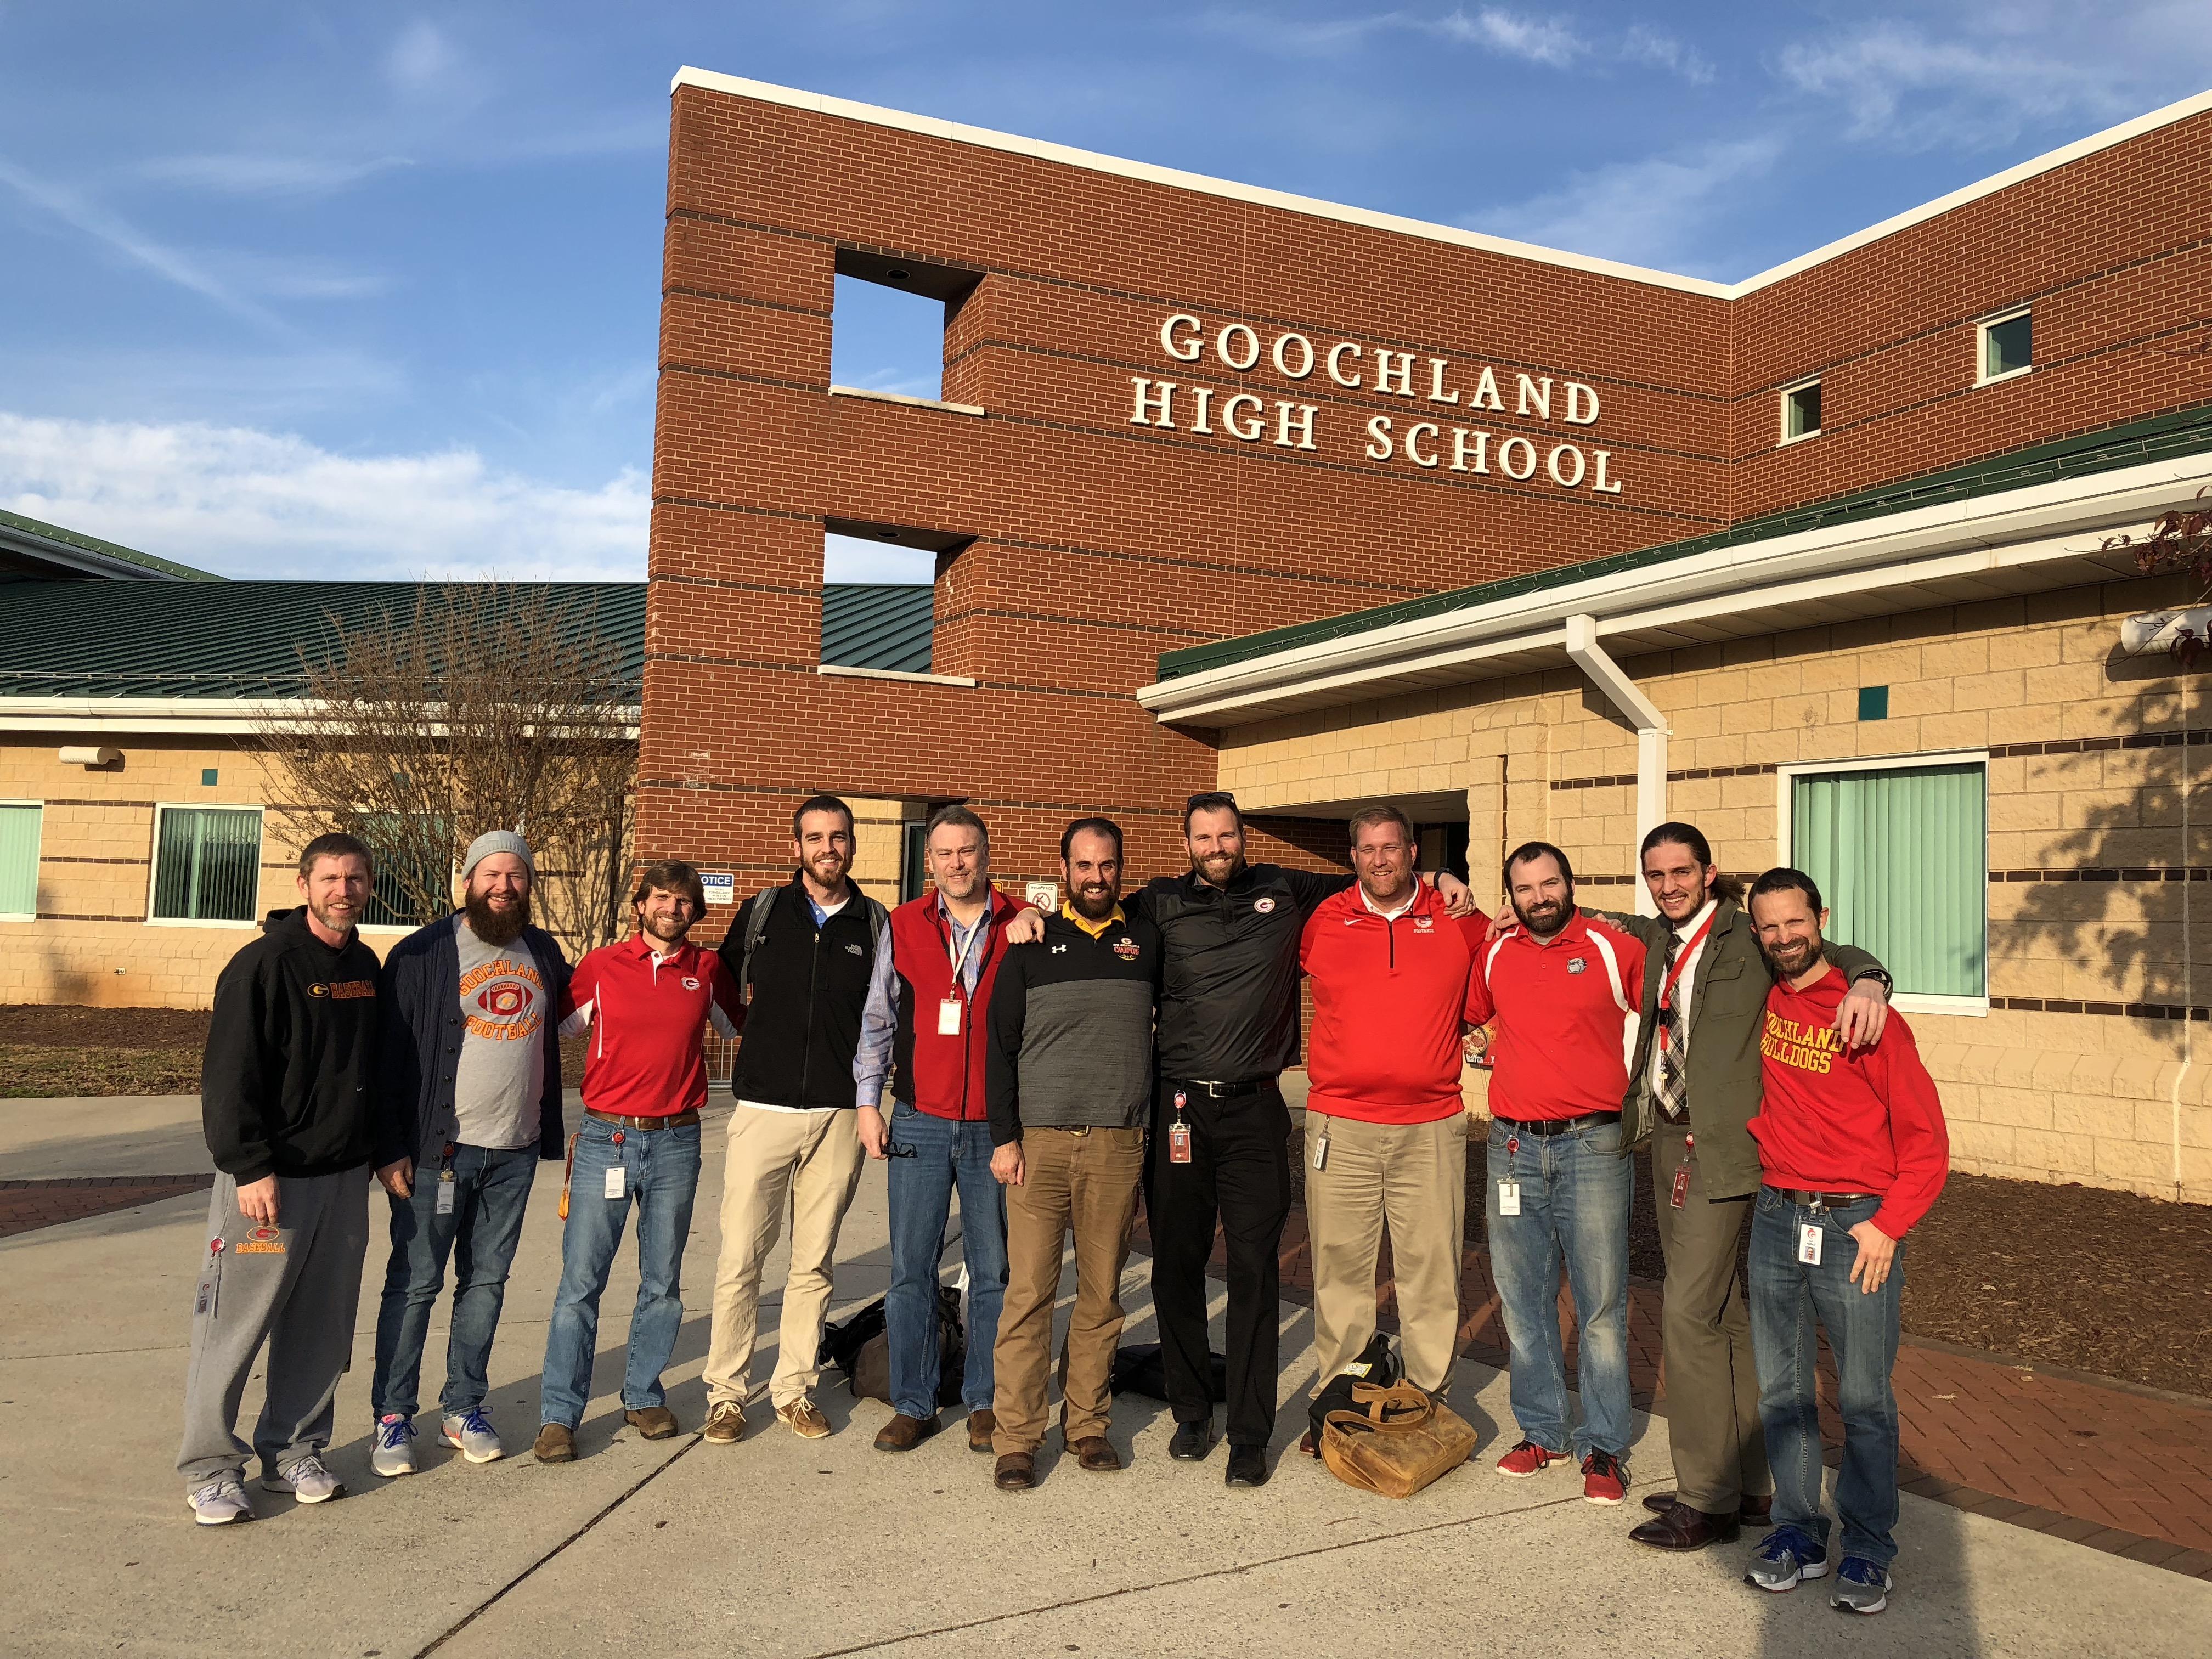 Goochland County Public Schools No Shave November 2017